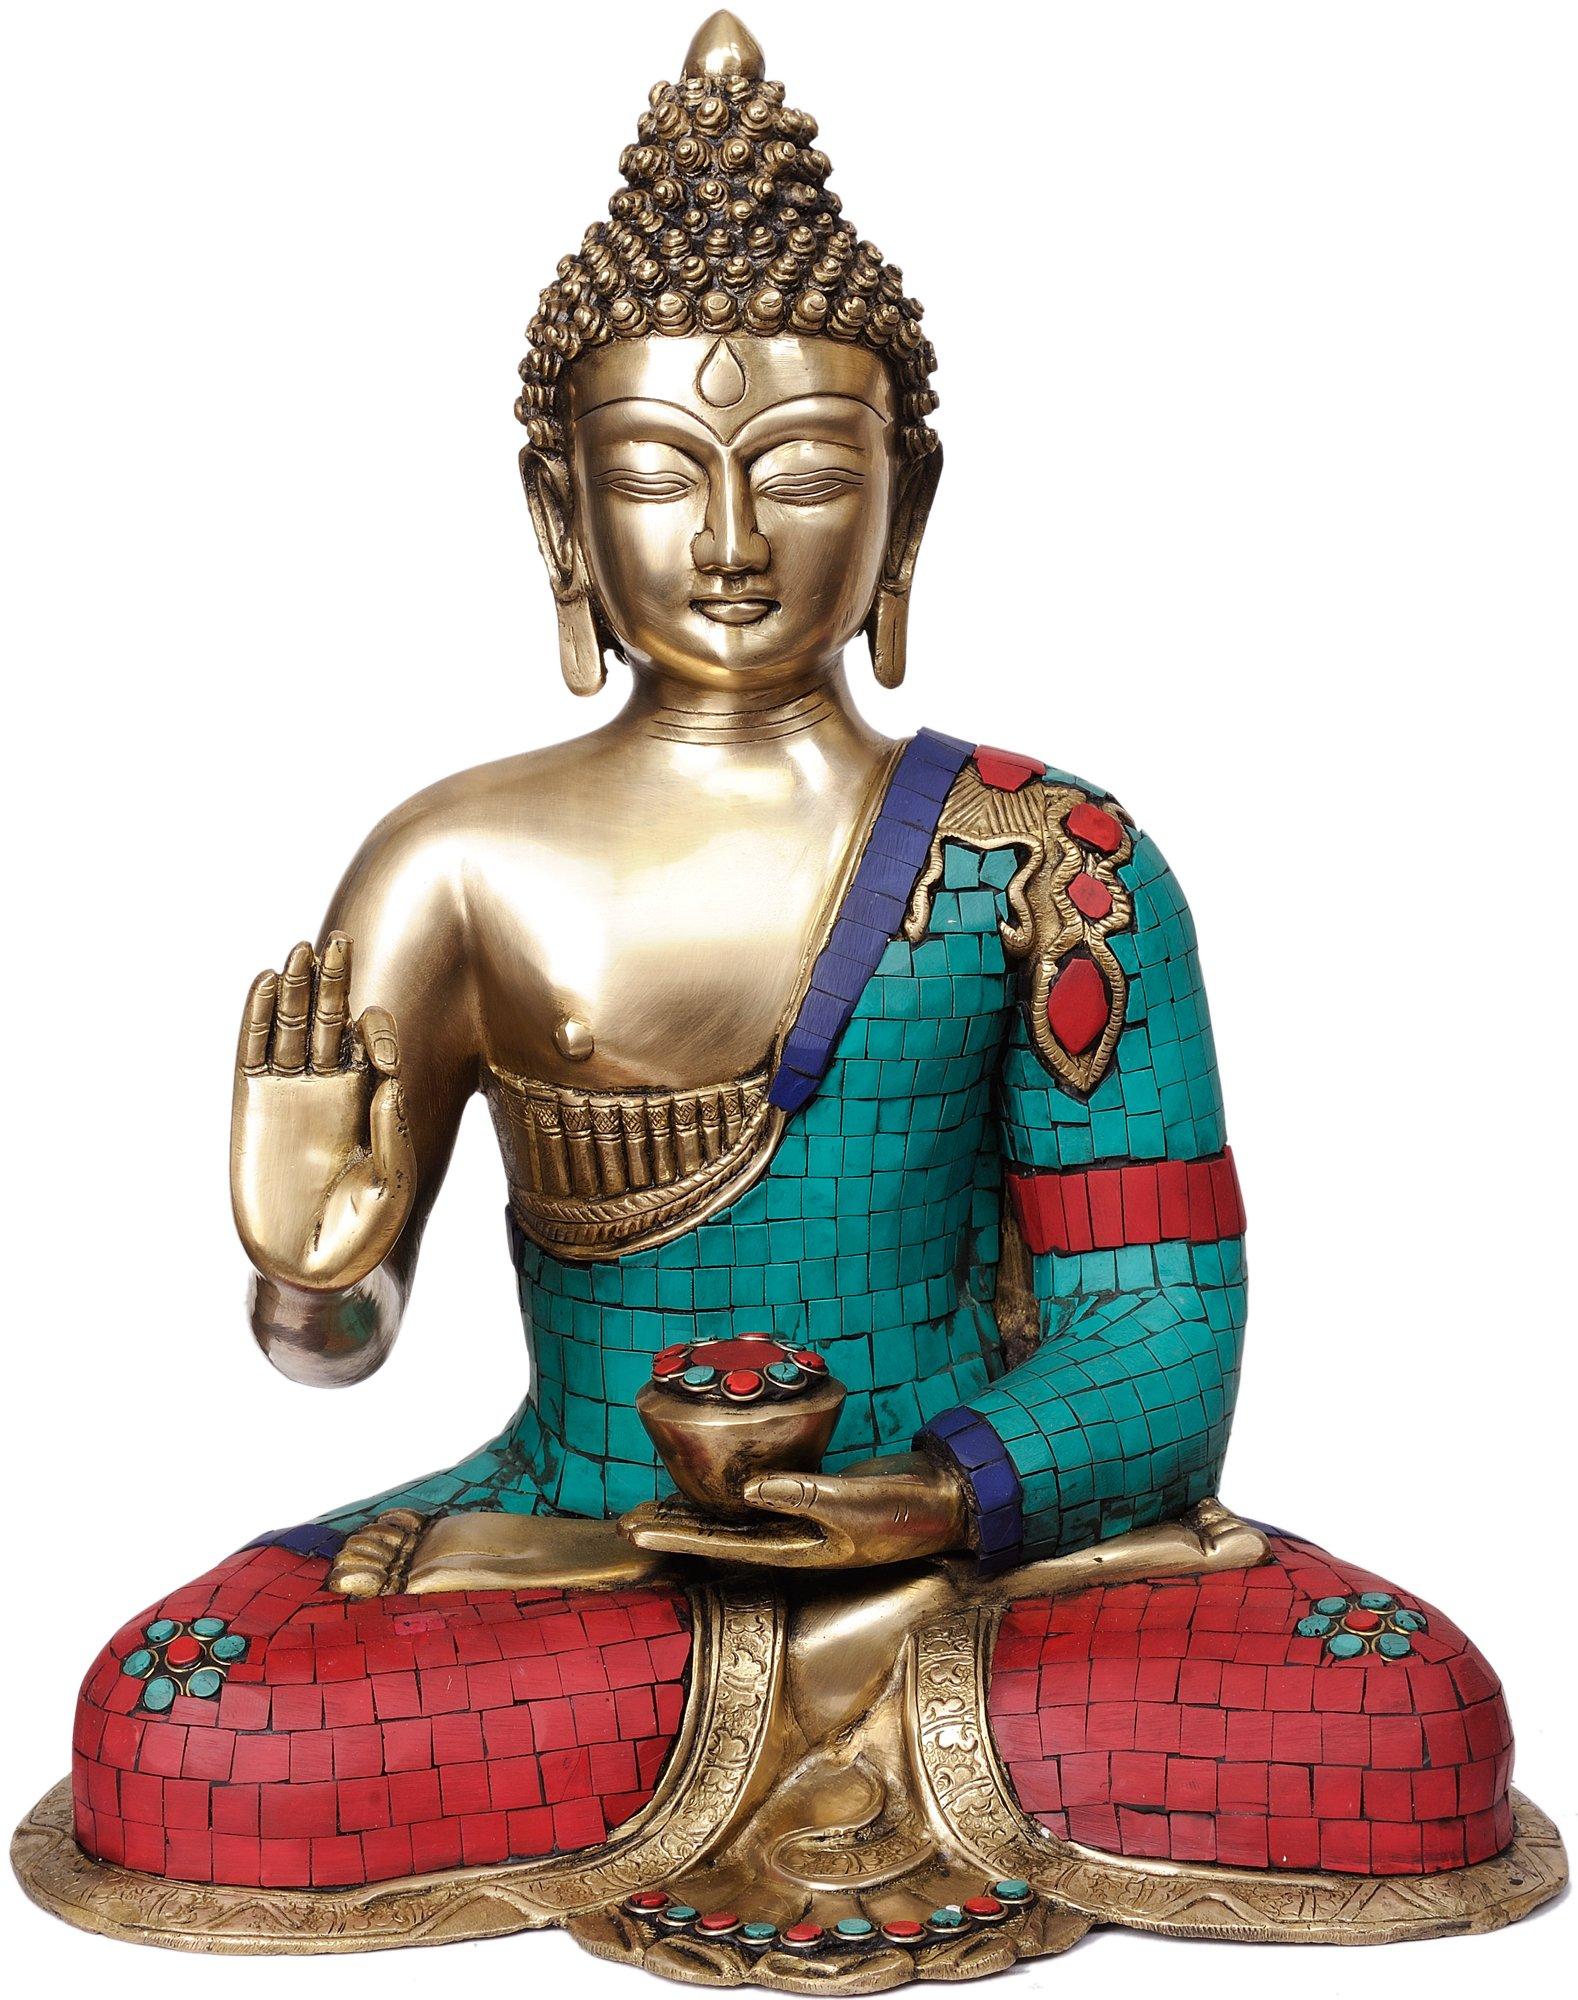 Preaching Buddha (with Fine Inlay Work) - Brass Statue